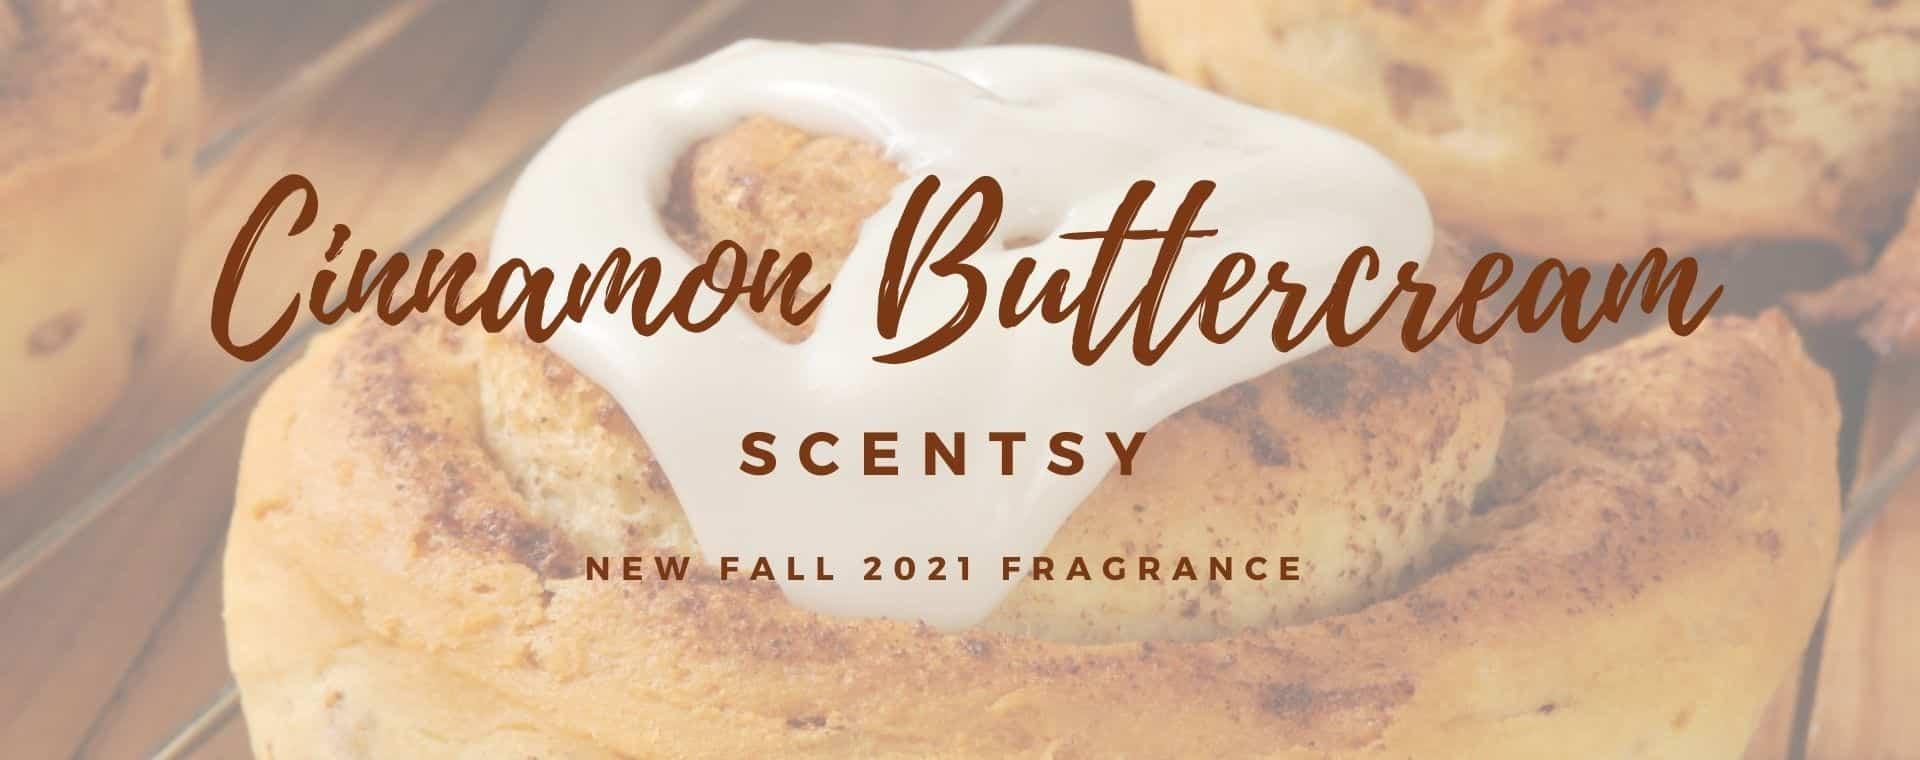 Cinnamon Buttercream Scentsy Fragrance